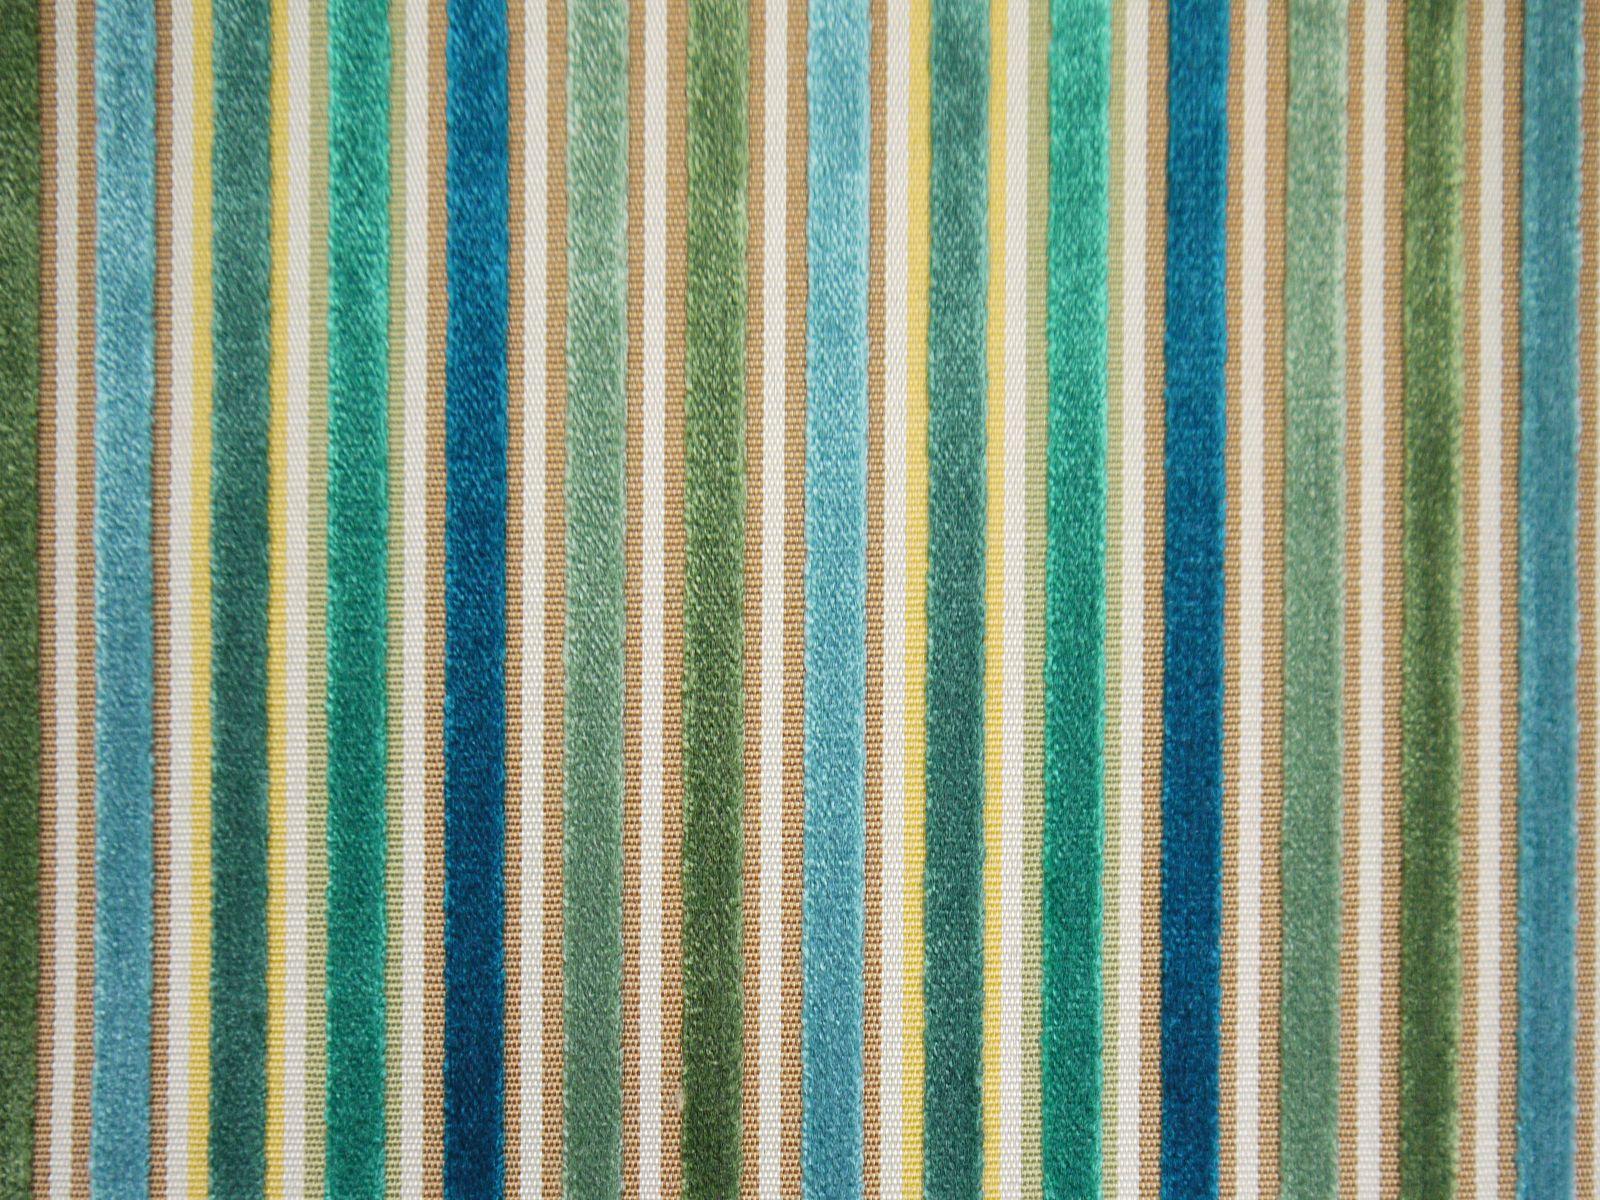 Teal, Emerald, Cedar, Moss, Jade   Upholstery Fabric - Pisa 1417 #velvetupholsteryfabric